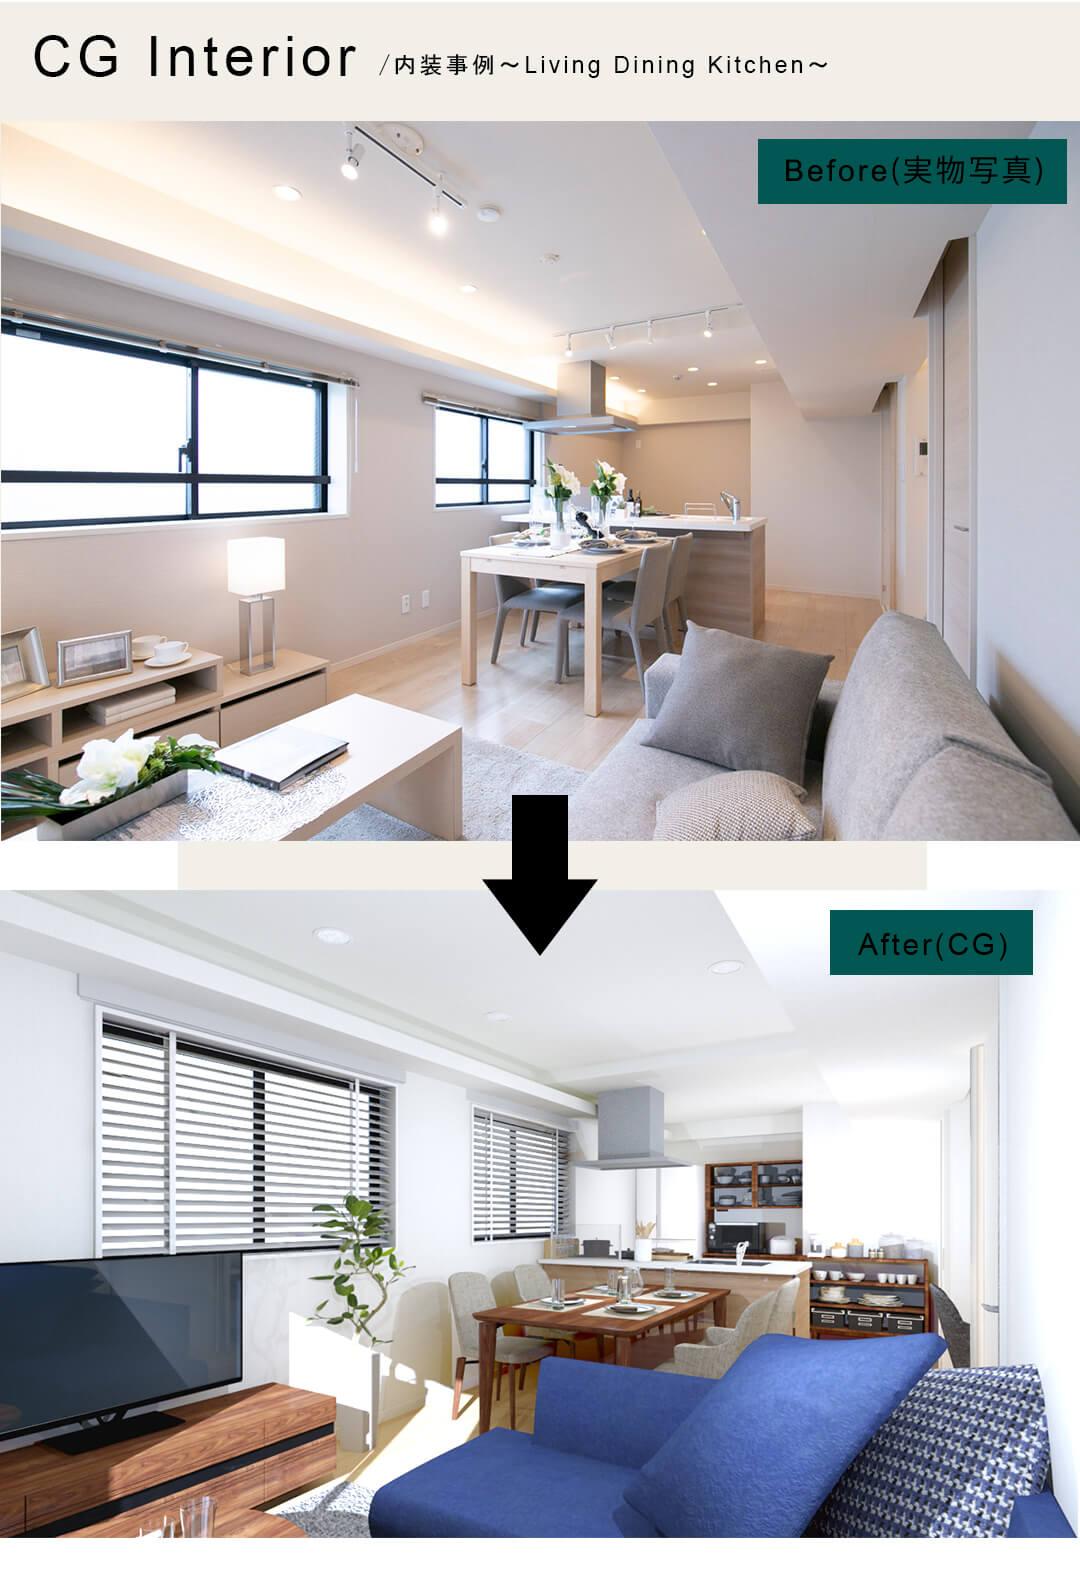 CG Interior,内装事例,LivingDiningKitchen